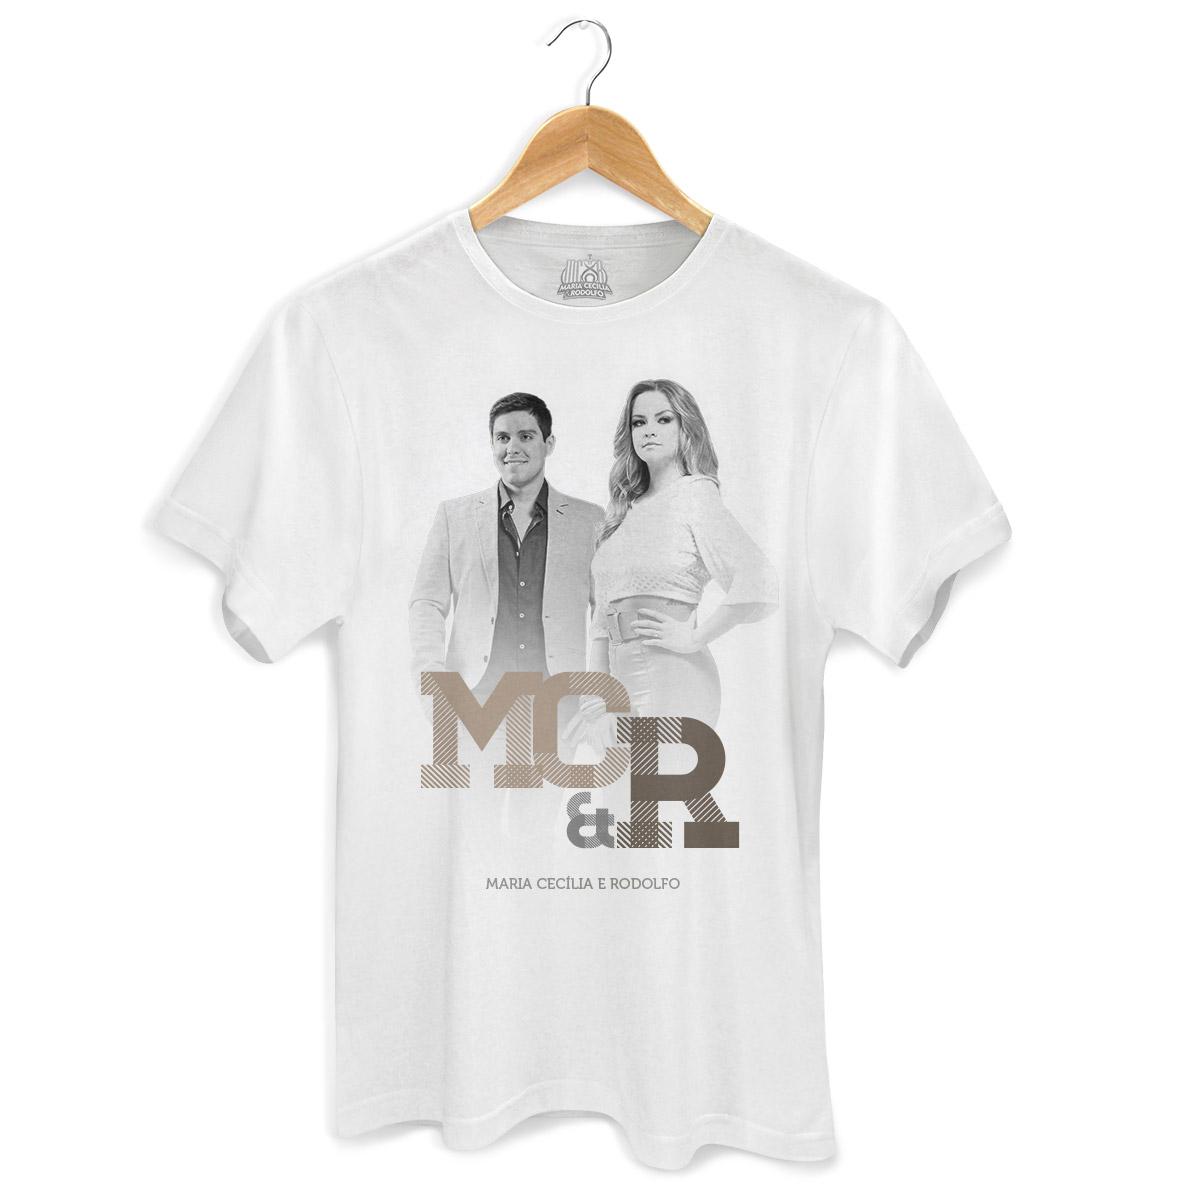 Camiseta Masculina Maria Cec�lia & Rodolfo Foto PB